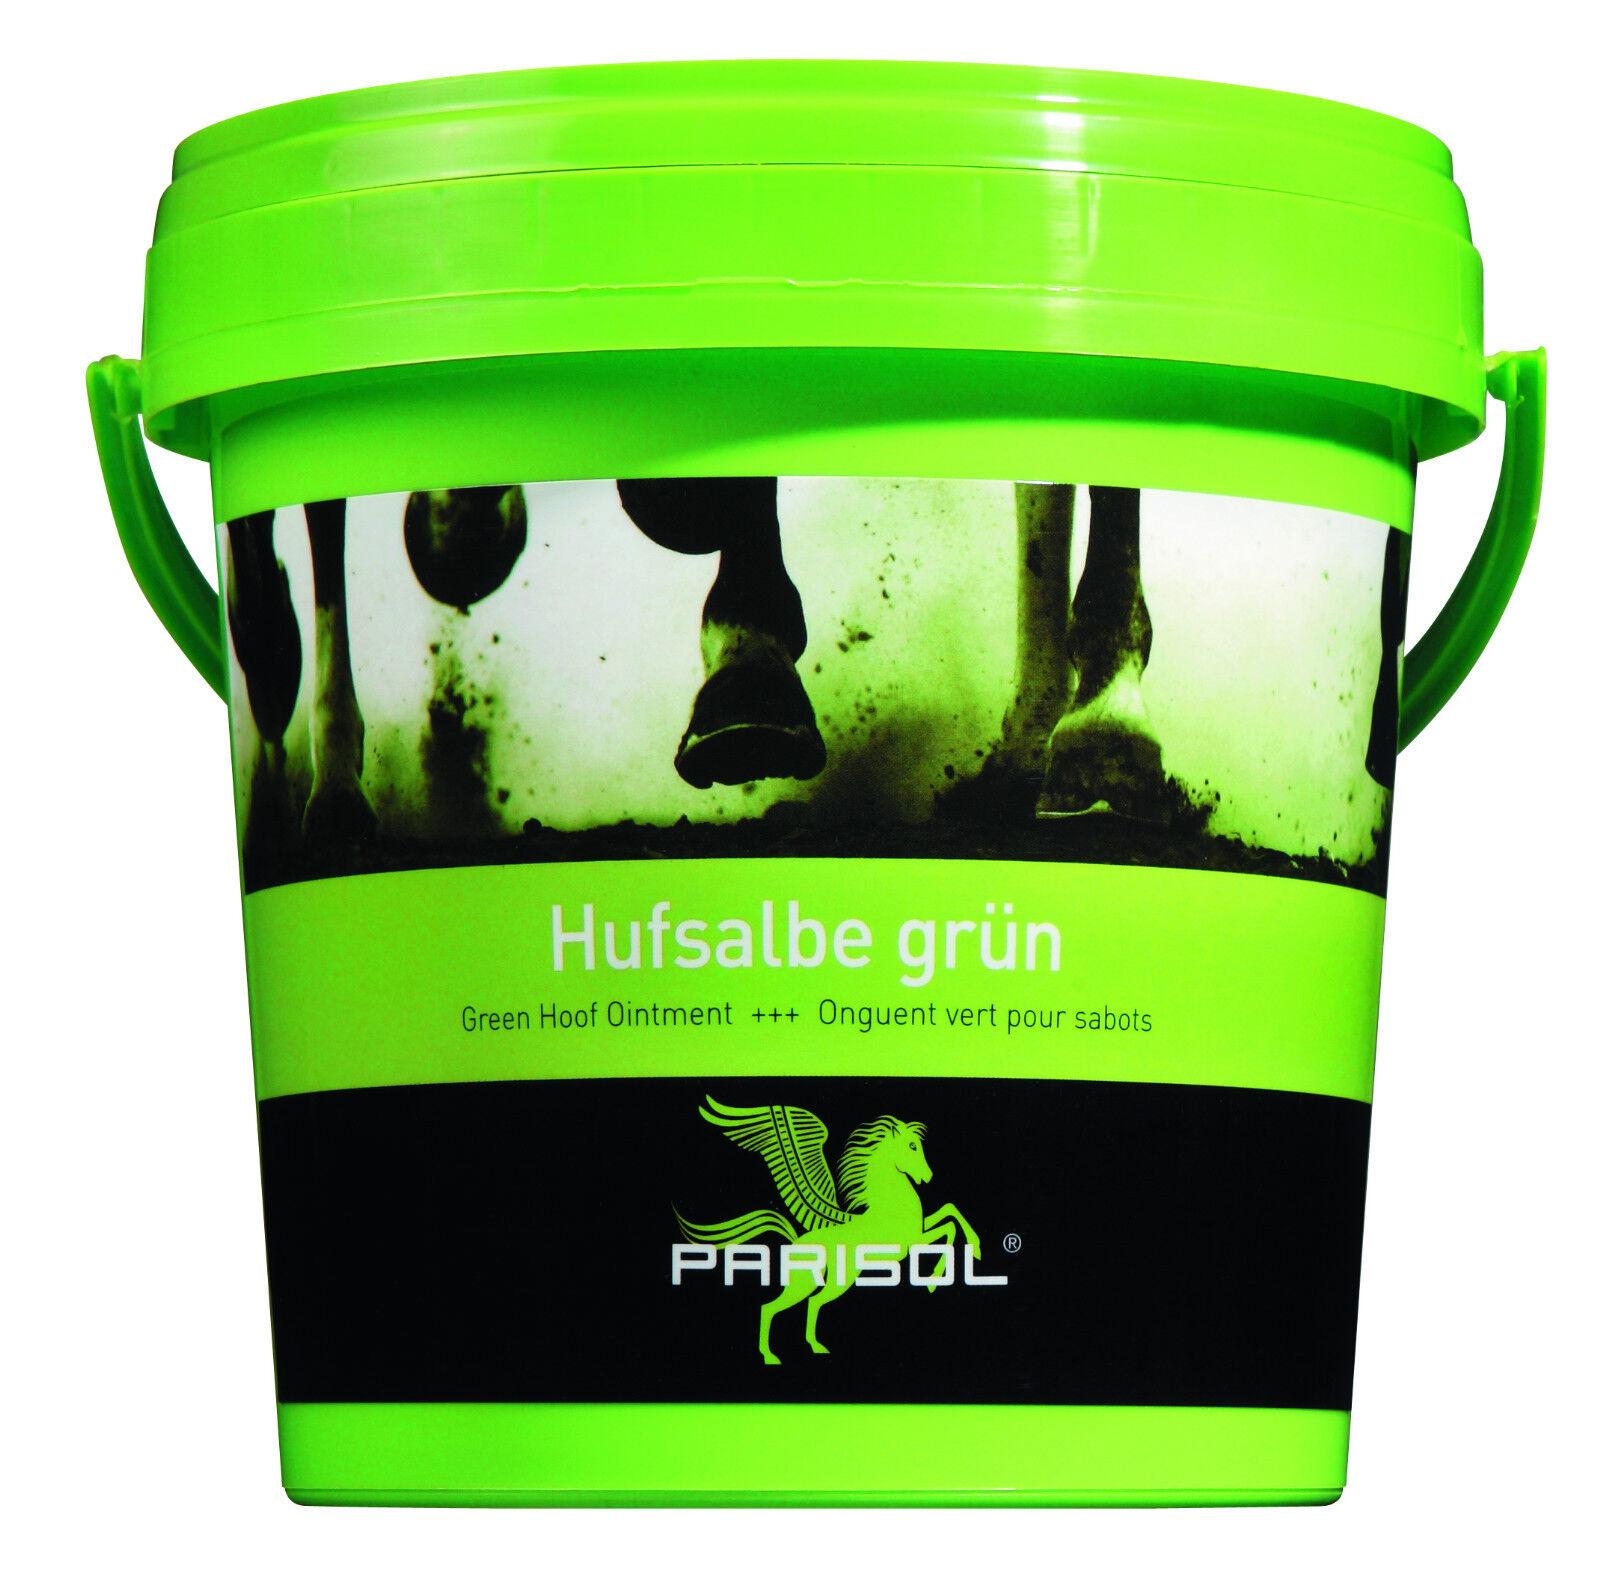 Parisol Hufsalbe Huffett 25 Liter farblos-gelb, grün grün grün oder schwarz ( /1000ml) 98498a